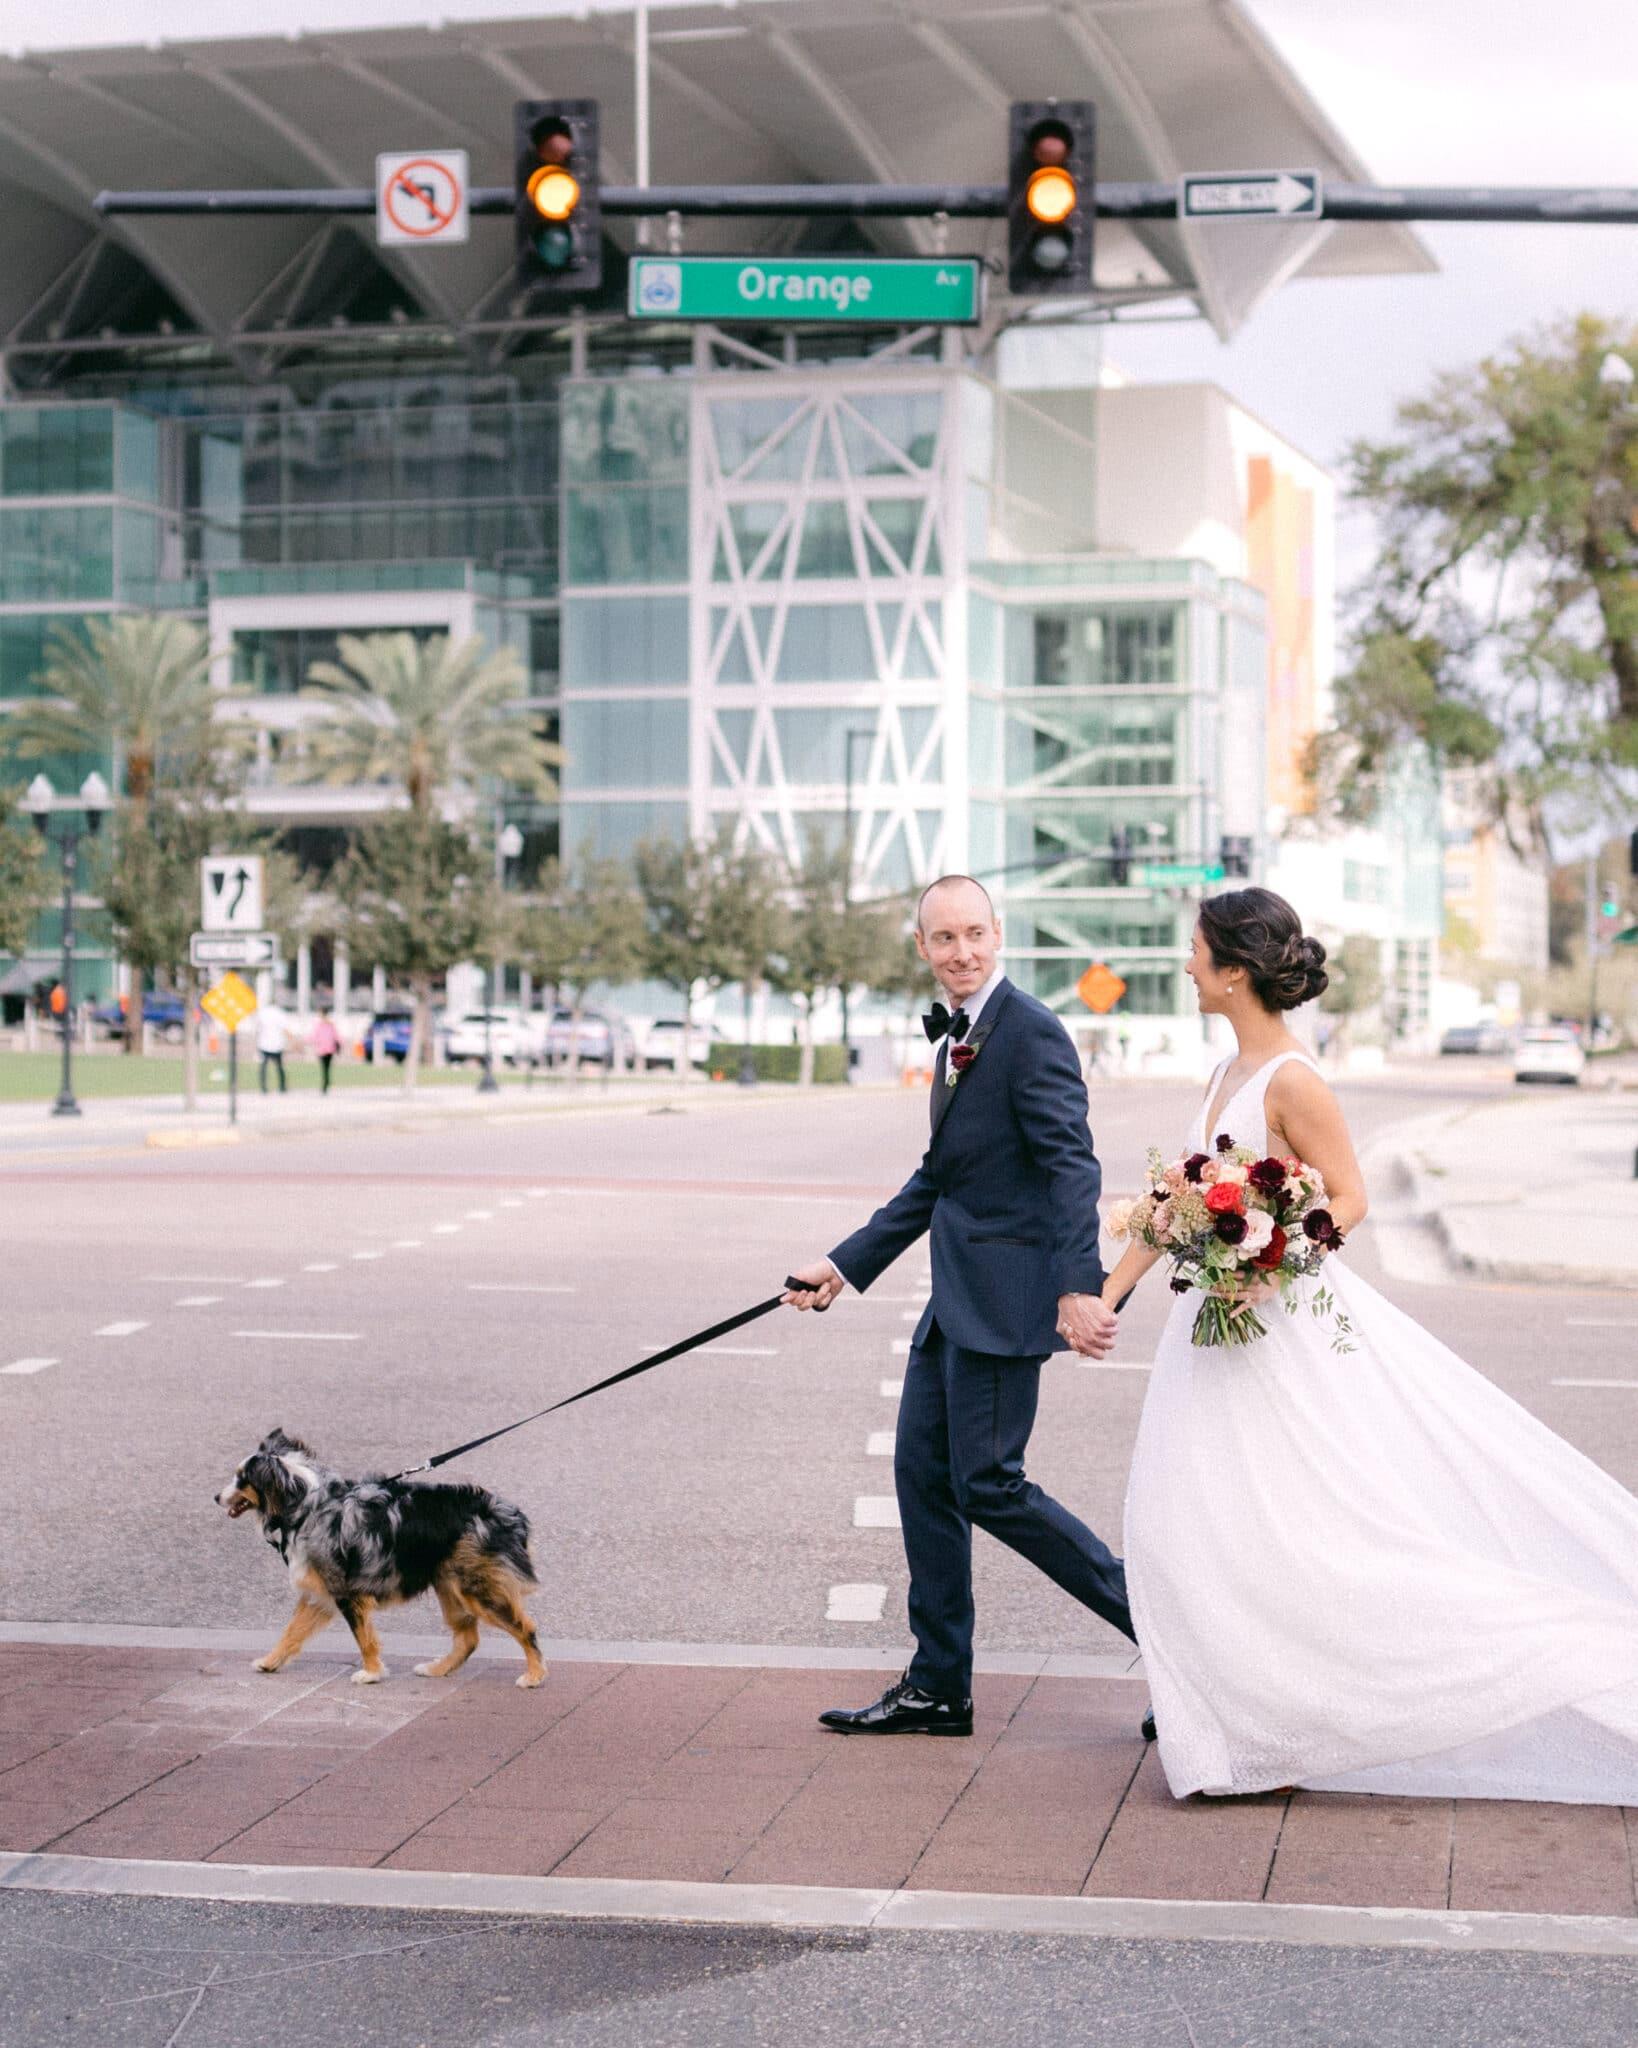 bride & groom walking across street with dog